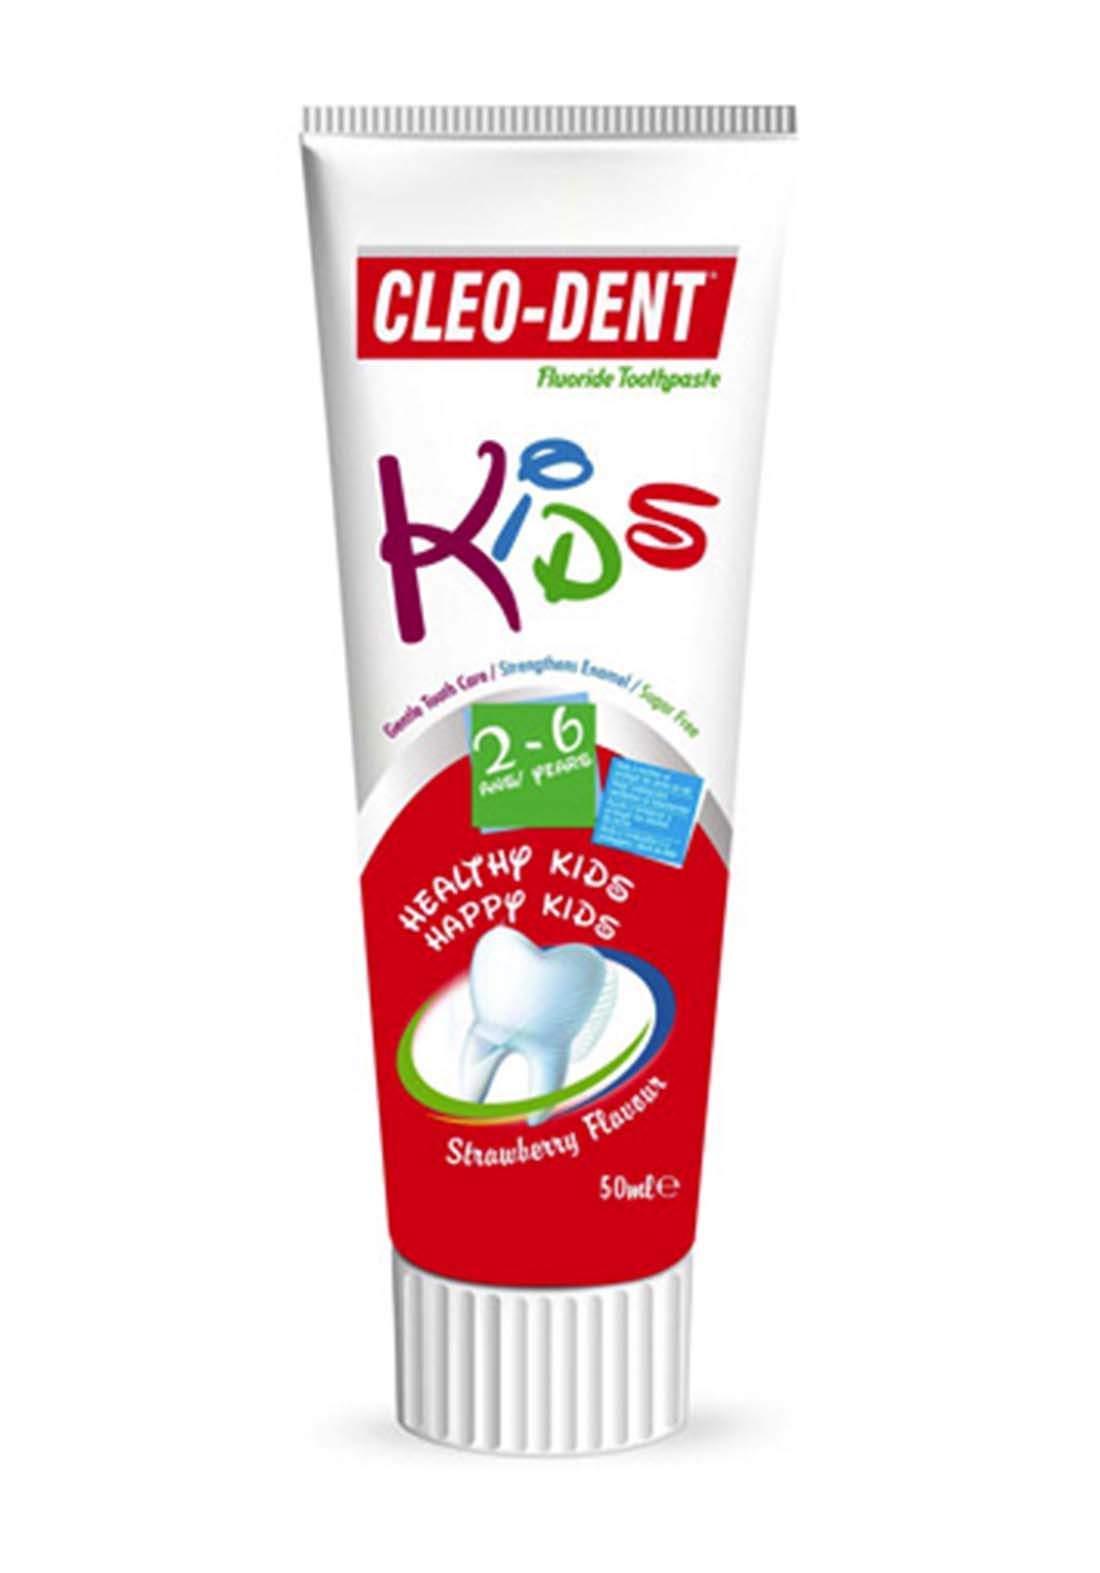 Cleo Dent Kids Fluoride Toothpaste معجون اسنان للأطفال بالفلورايد